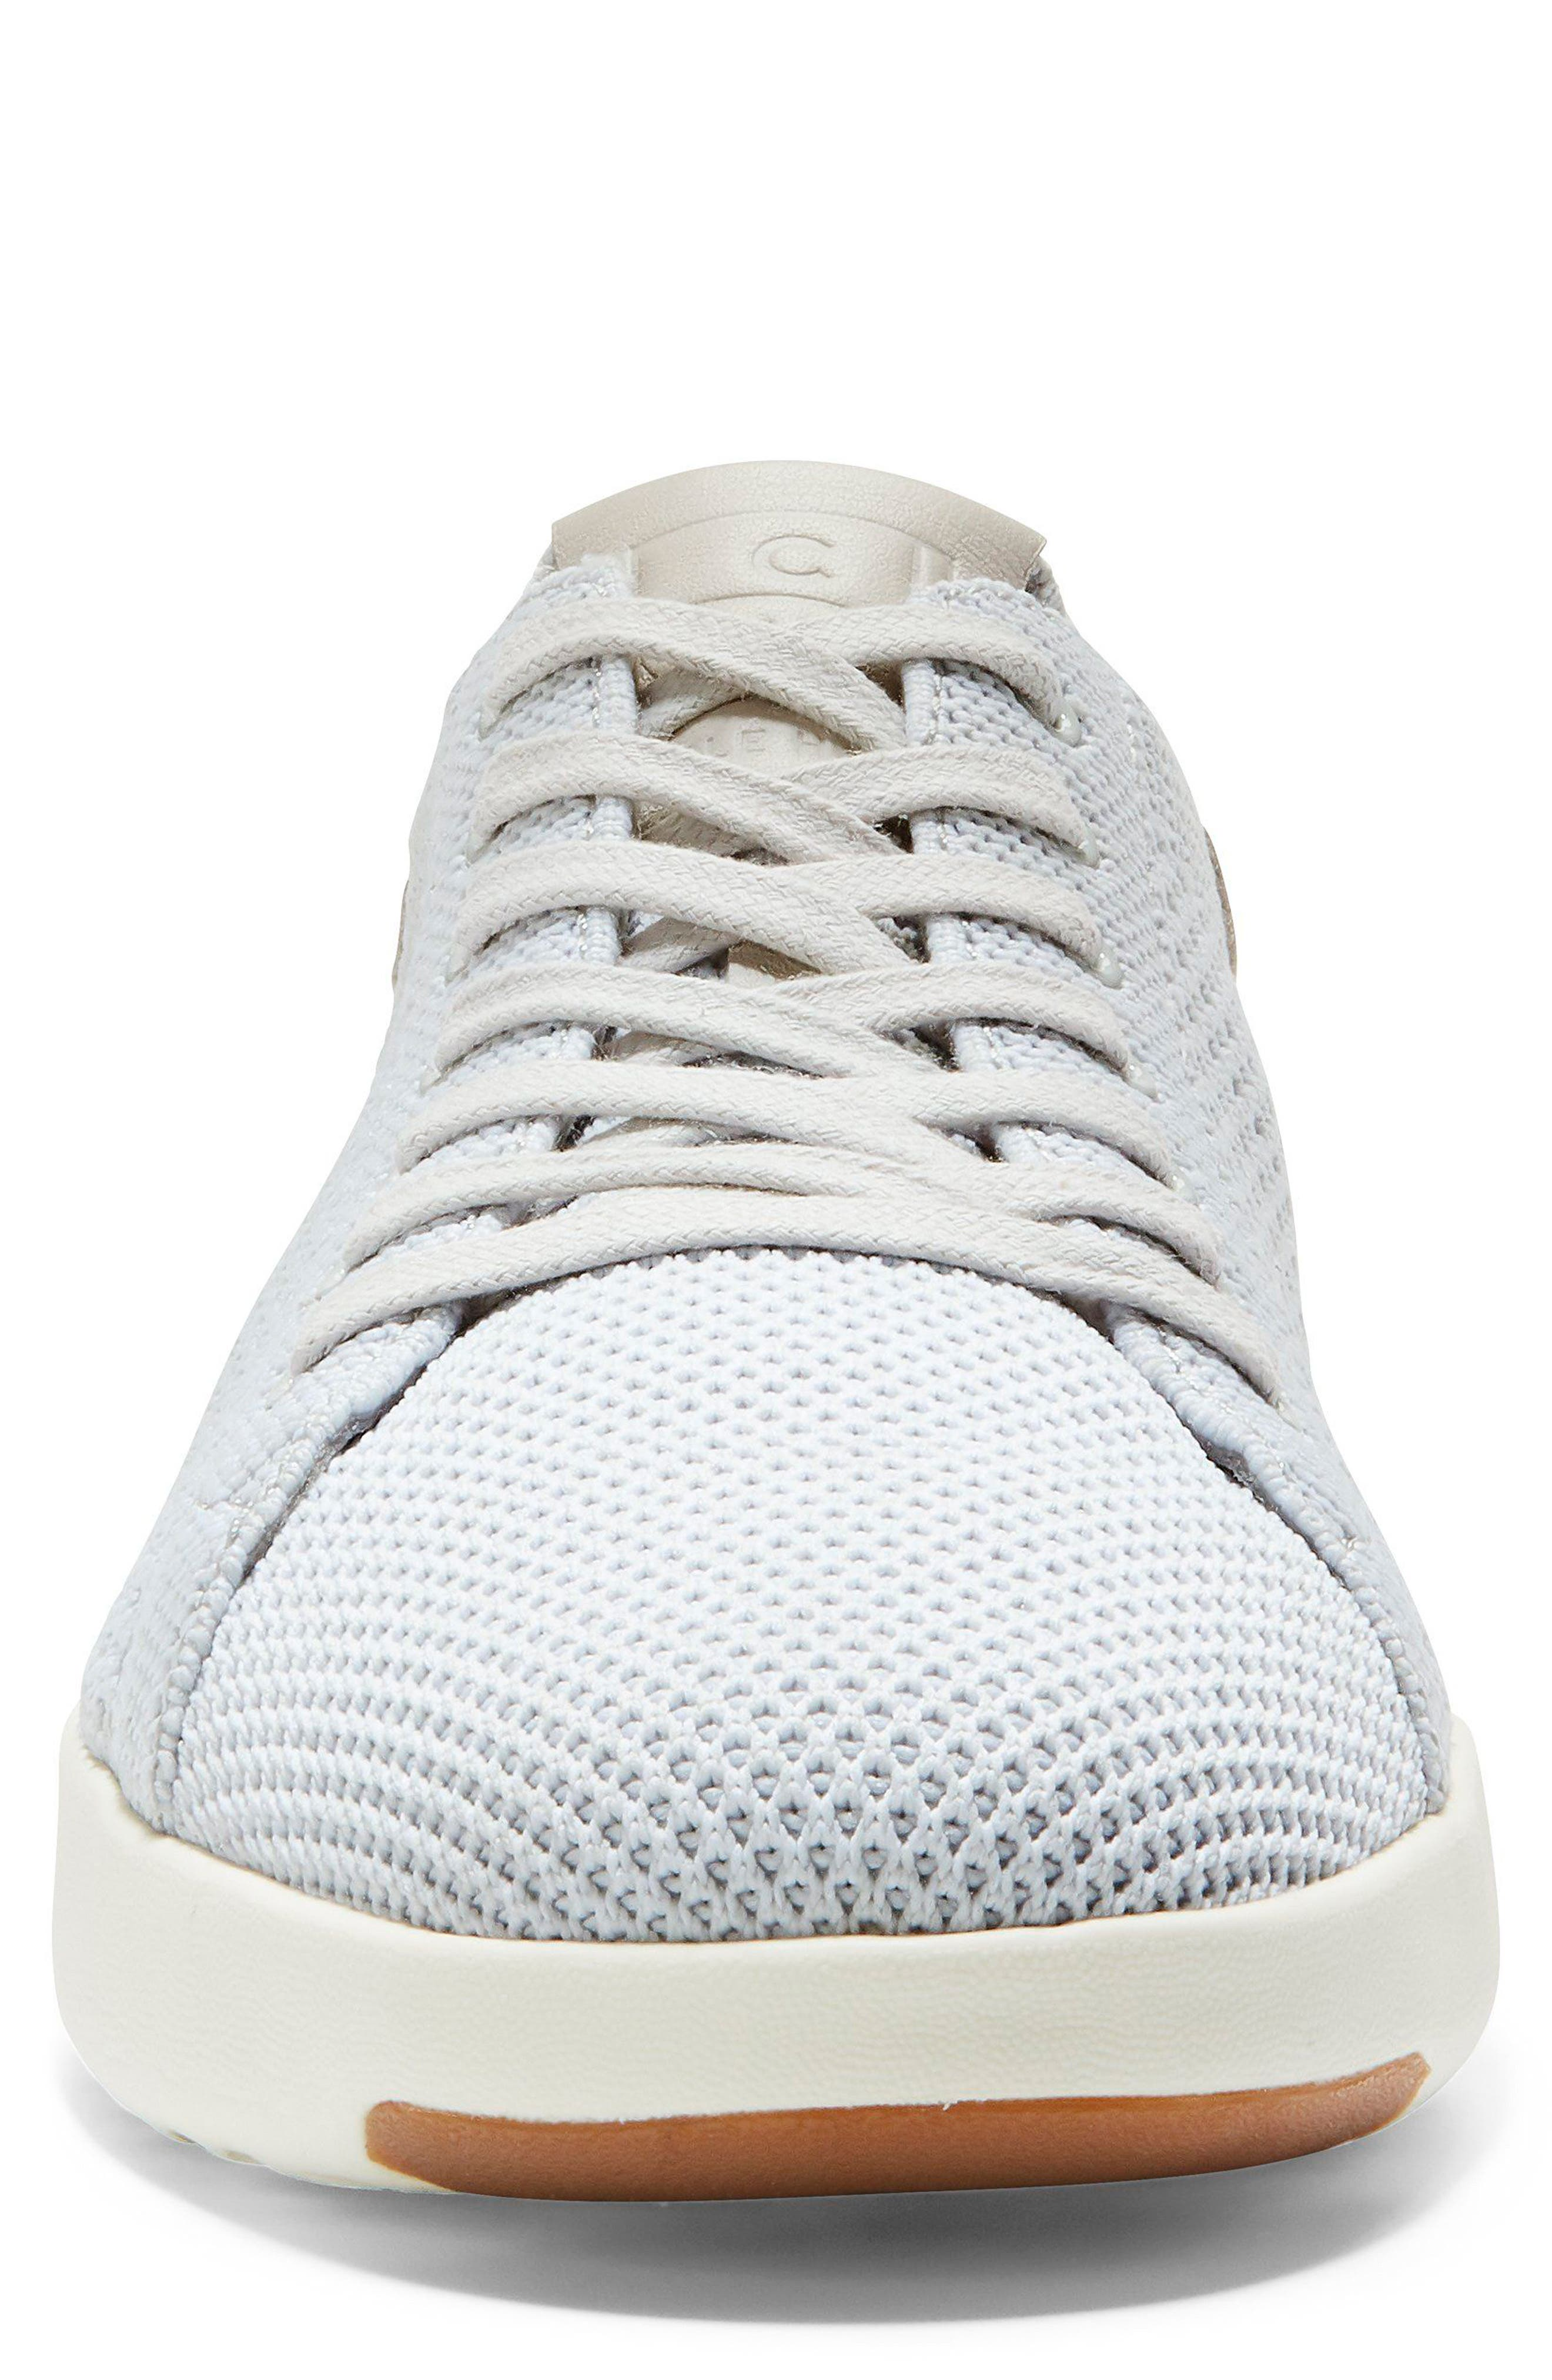 GrandPro Tennis Stitchlite Sneaker,                             Alternate thumbnail 4, color,                             Vapor Gray/ Optic White